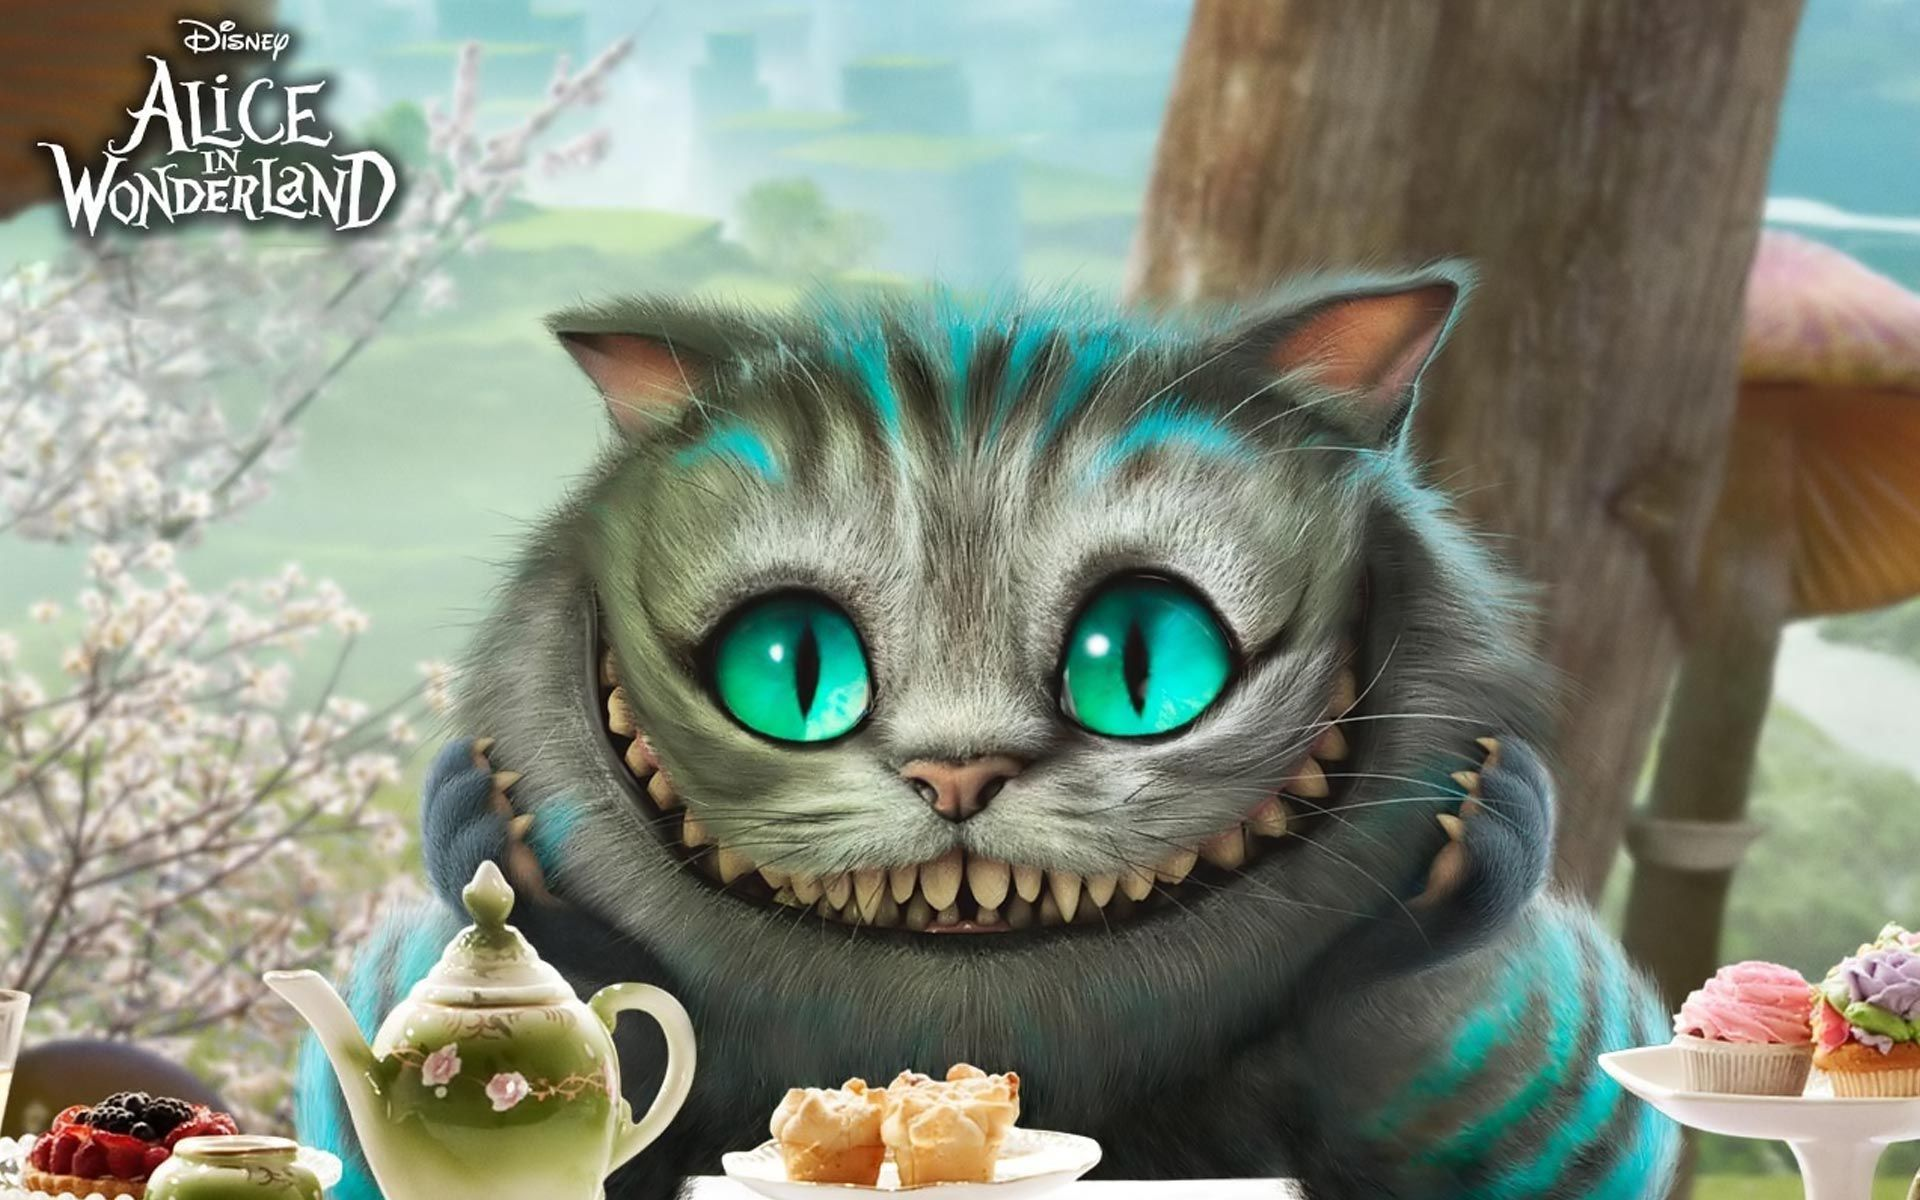 Sugar Skull Iphone Wallpaper Alice In Wonderland Smiling Cat In 2019 Grinsekatze